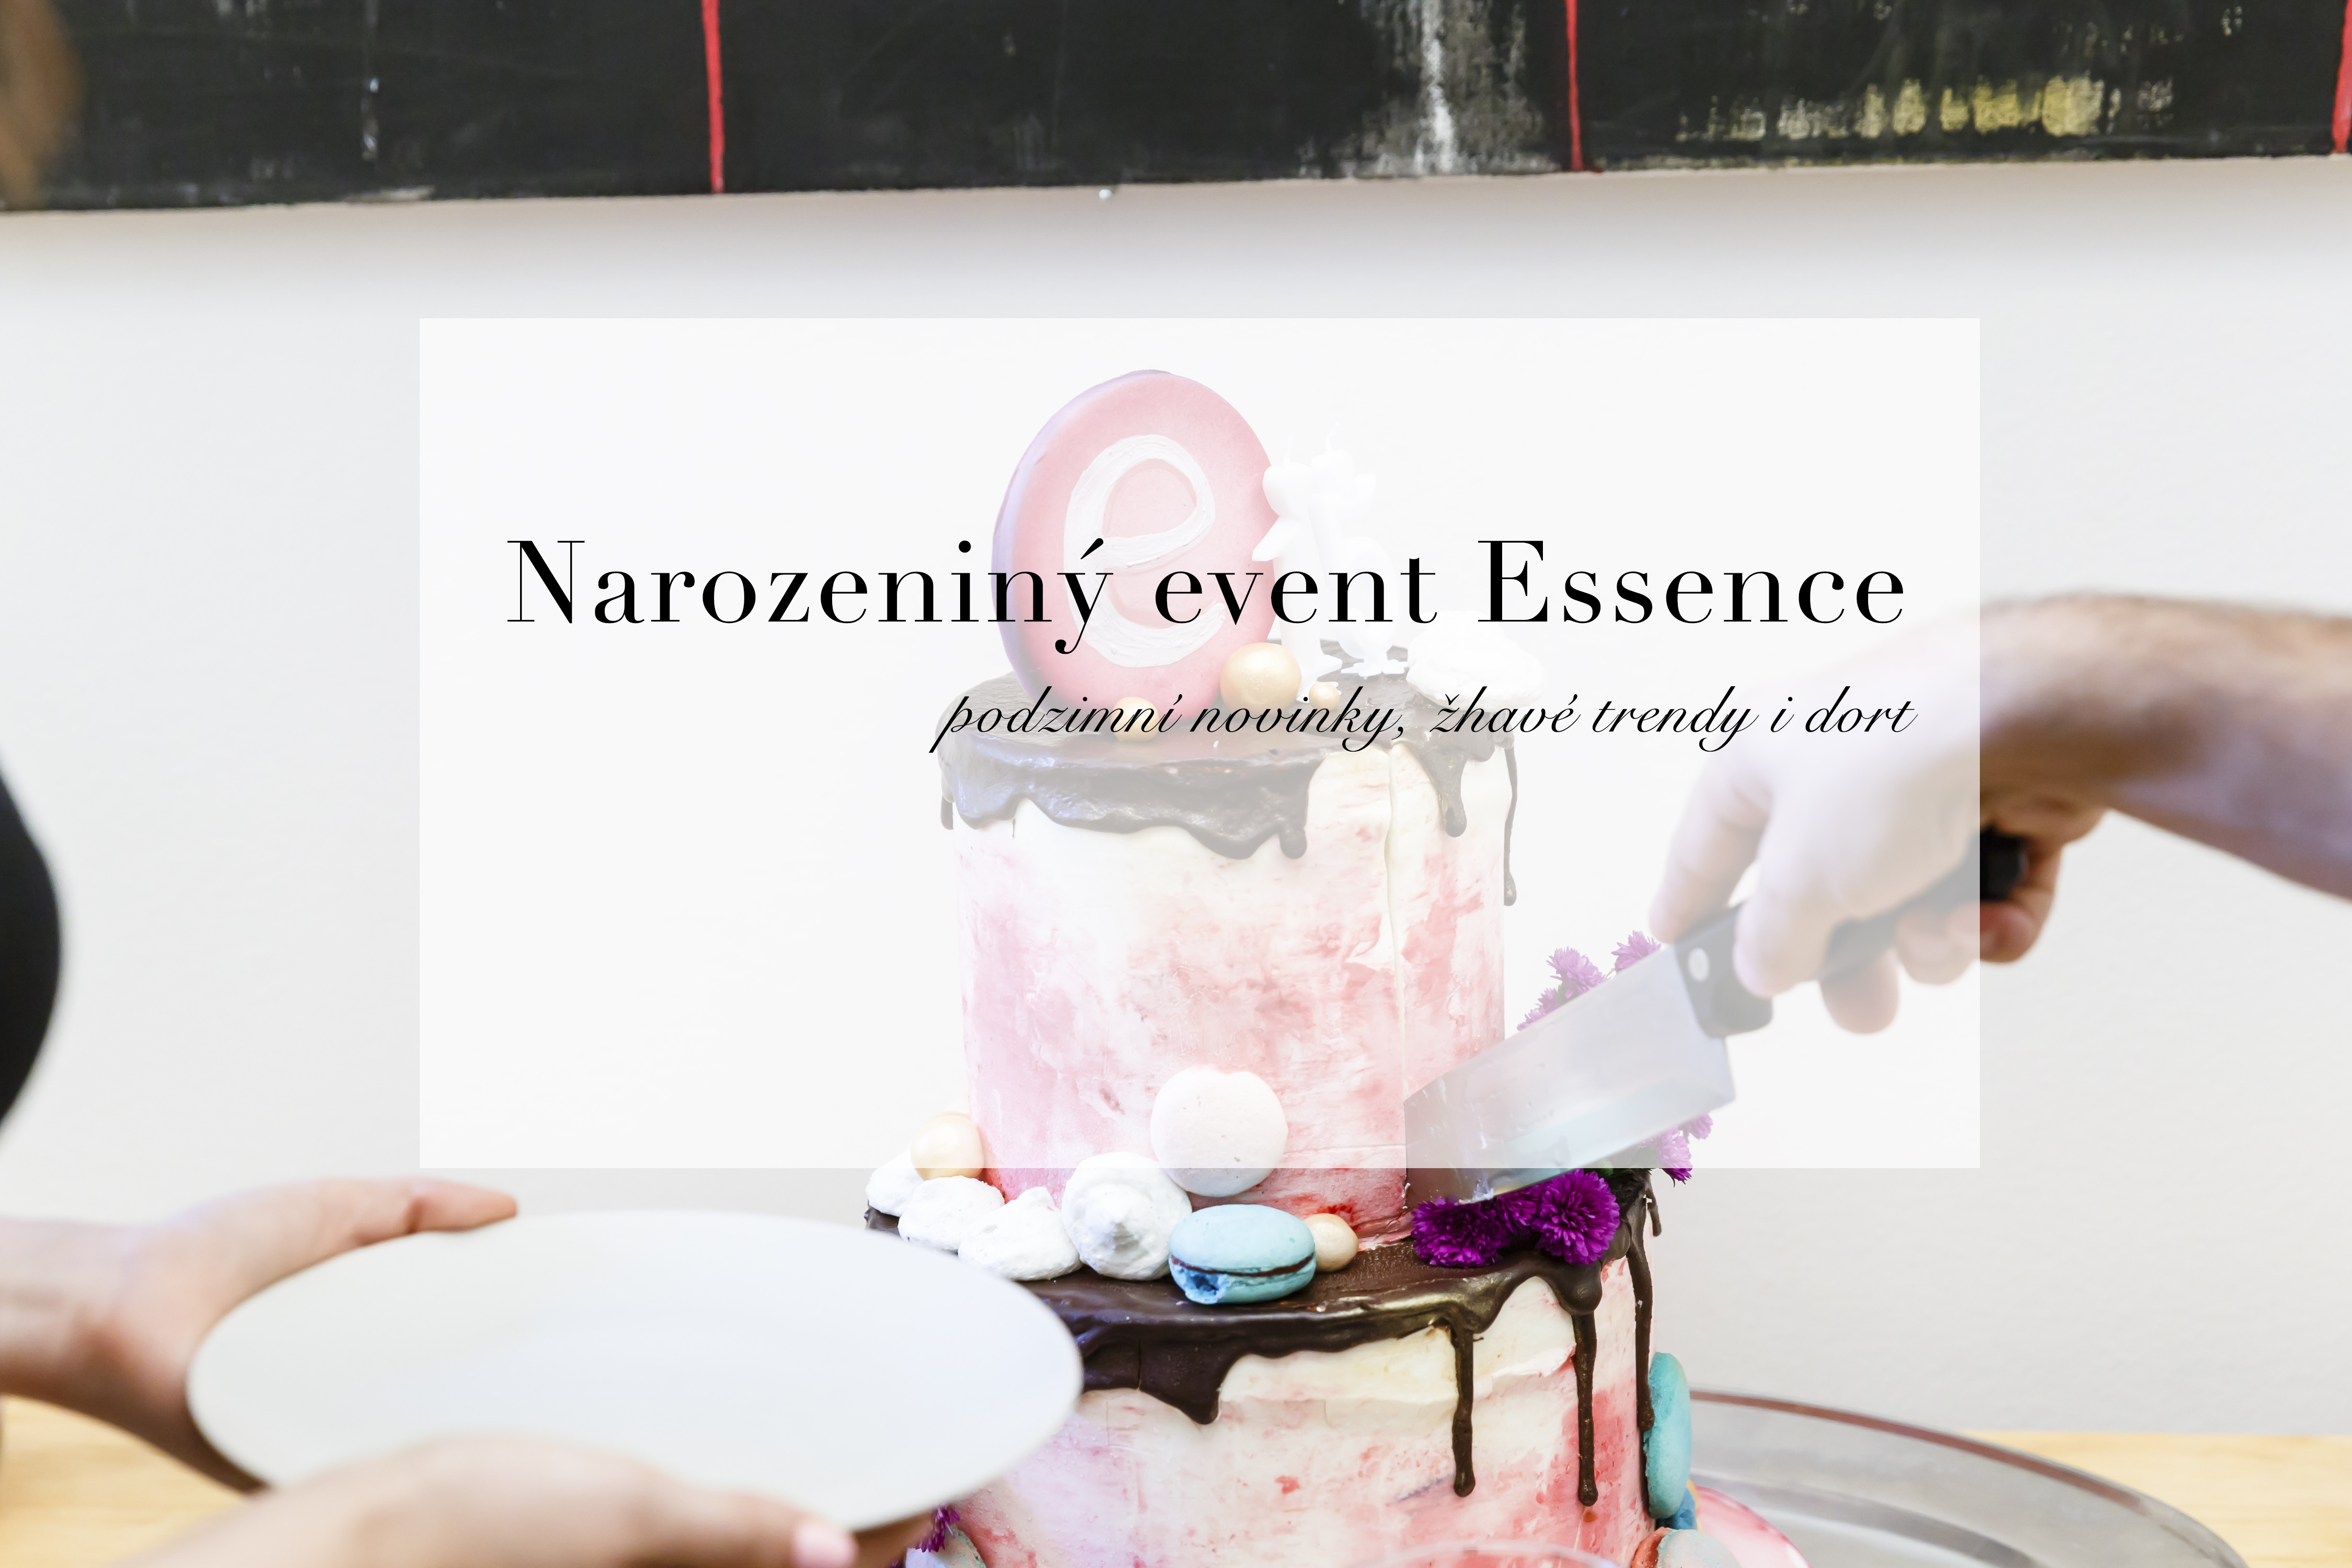 essence event